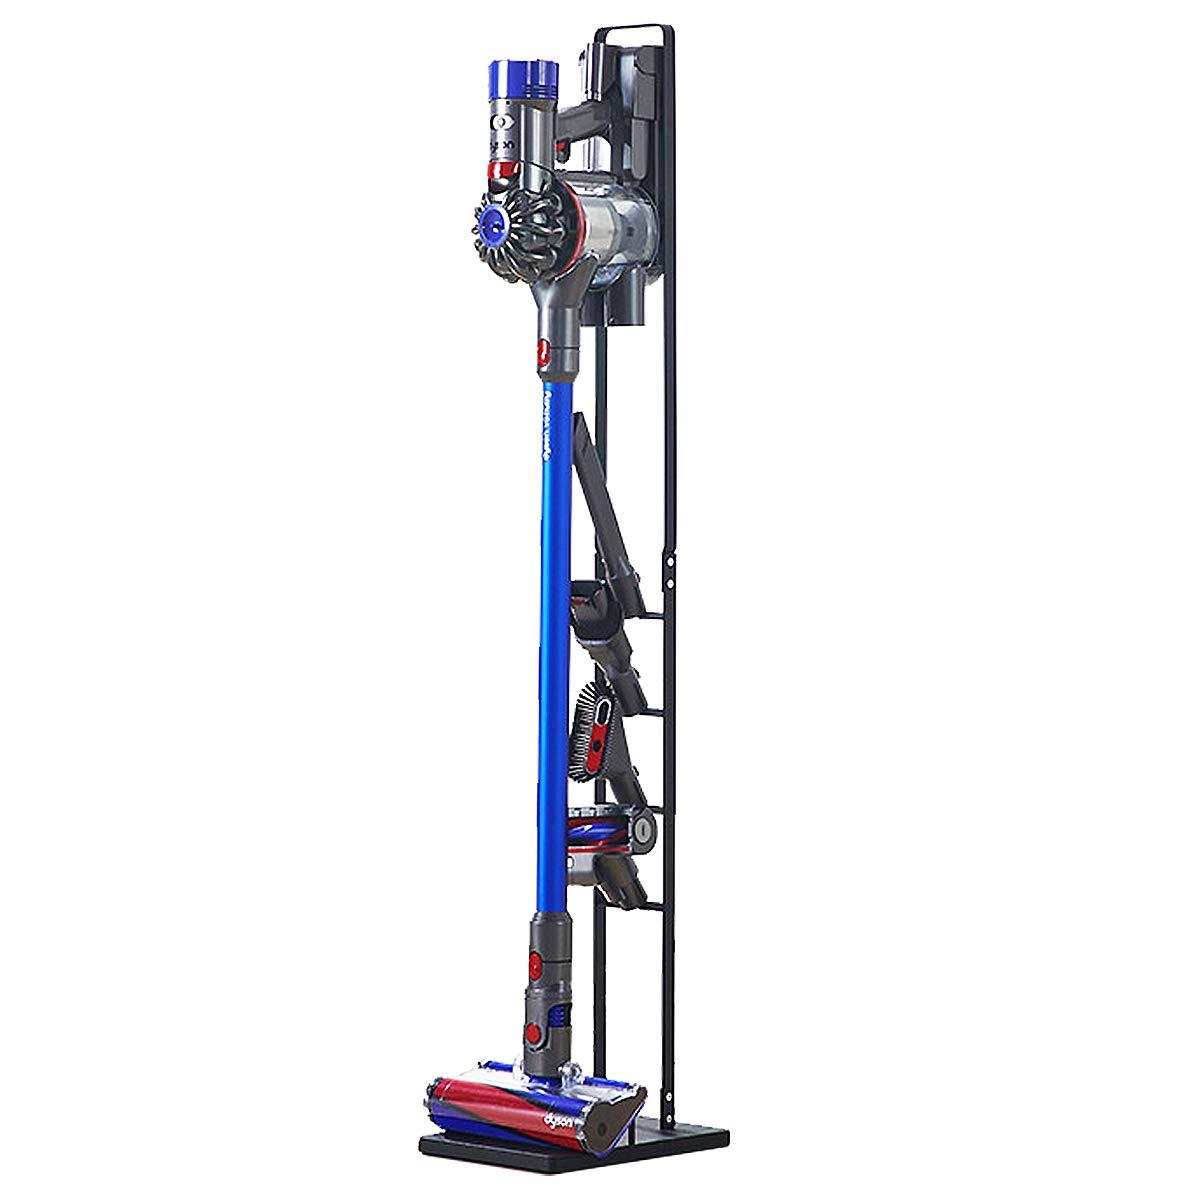 HOMON Stable Metal Storage Bracket Stand Holder for Dyson Handheld for V10 V8 V7 V6 Cordless Vacuum Cleaners Vacuum Docking Station by HOMON